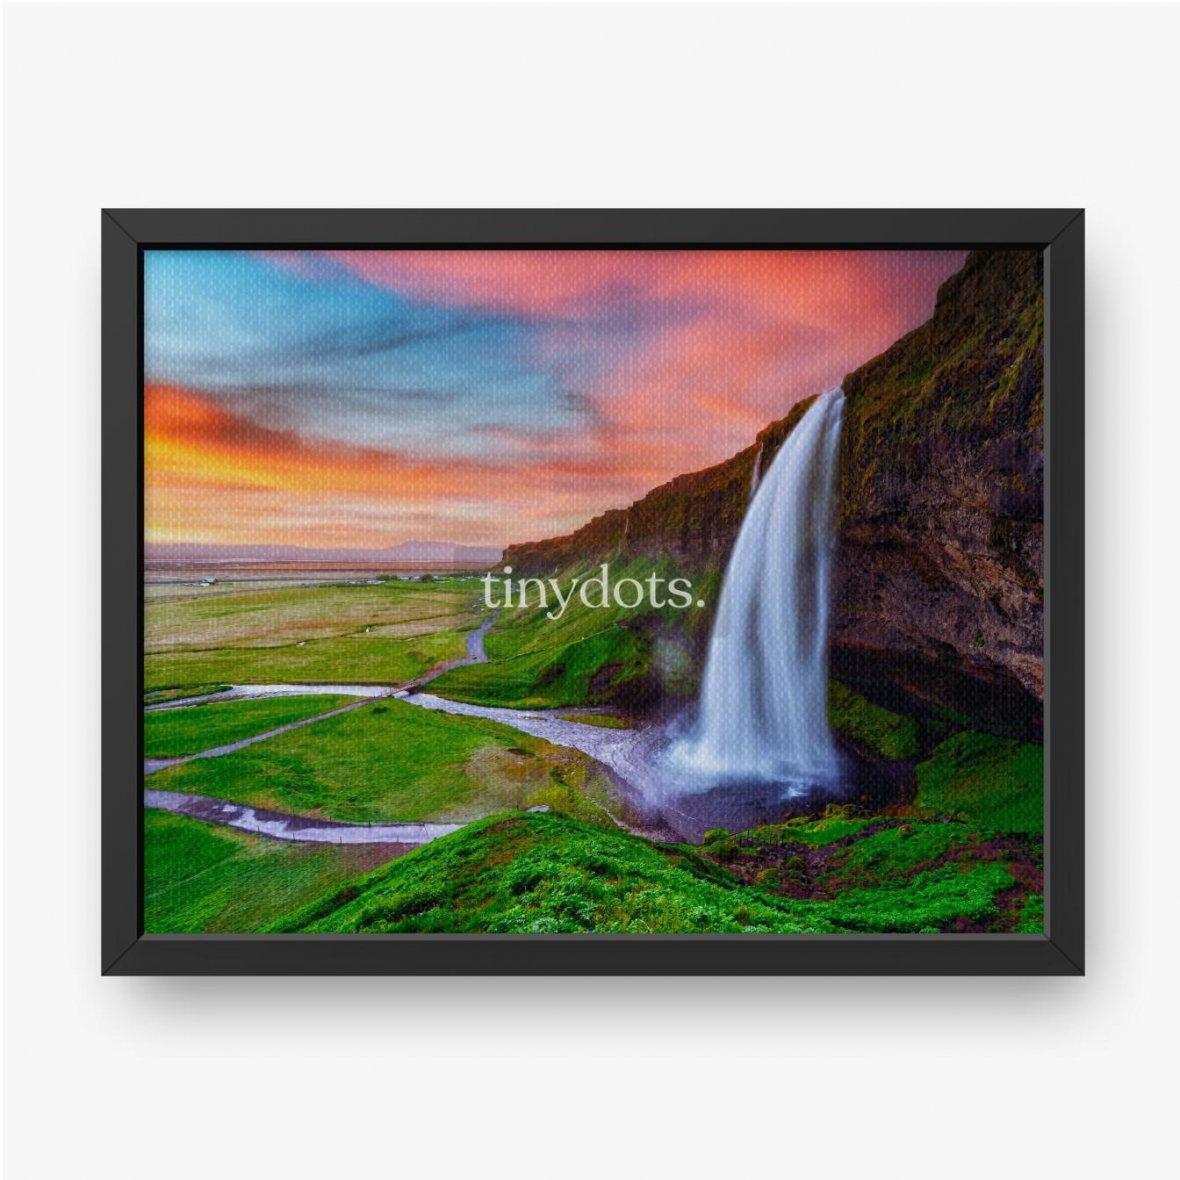 Gerahmte Leinwandbilder Sonnenaufgang auf Seljalandfoss Wasserfall auf Seljalandsa Fluss, Island, Europa. Erstaunliche Aussicht von innen. Landschaftsfo